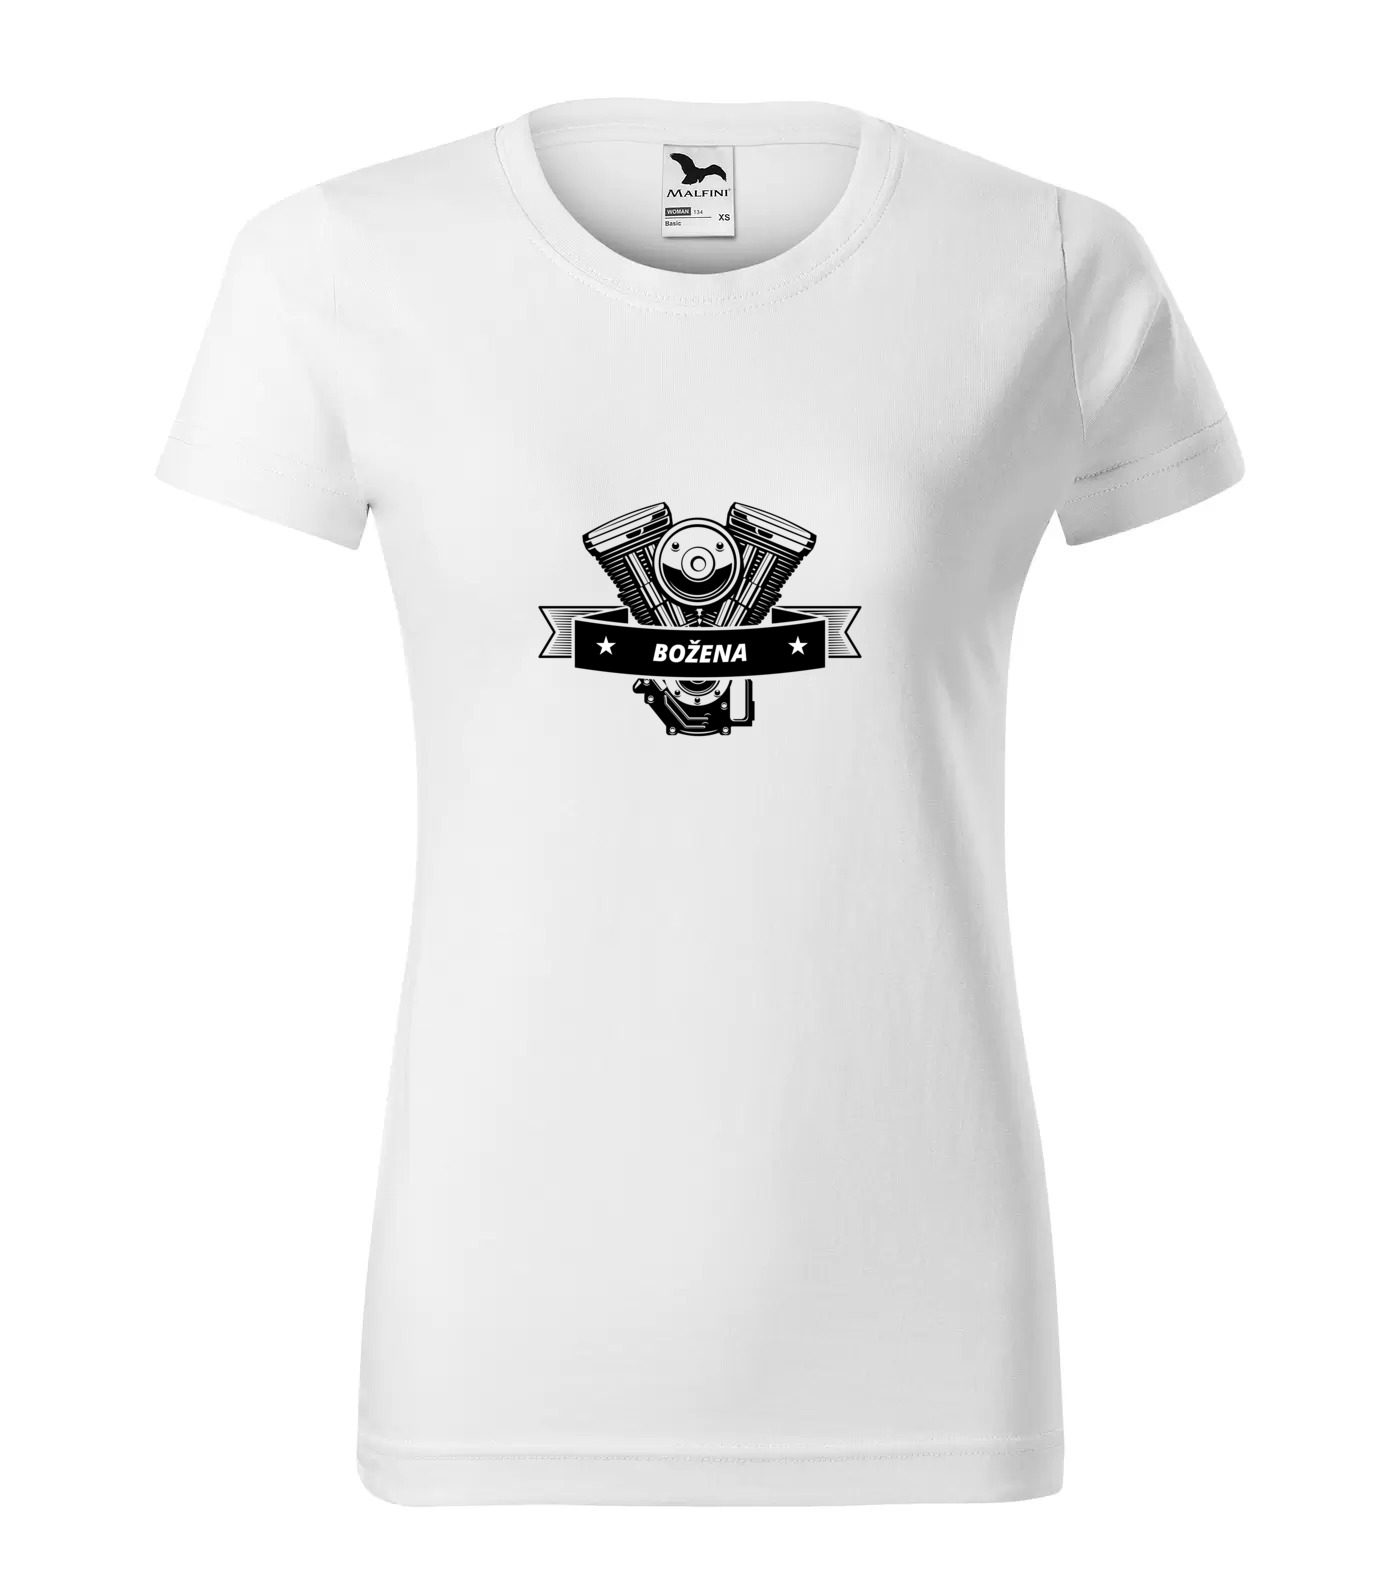 Tričko Motorkářka Božena